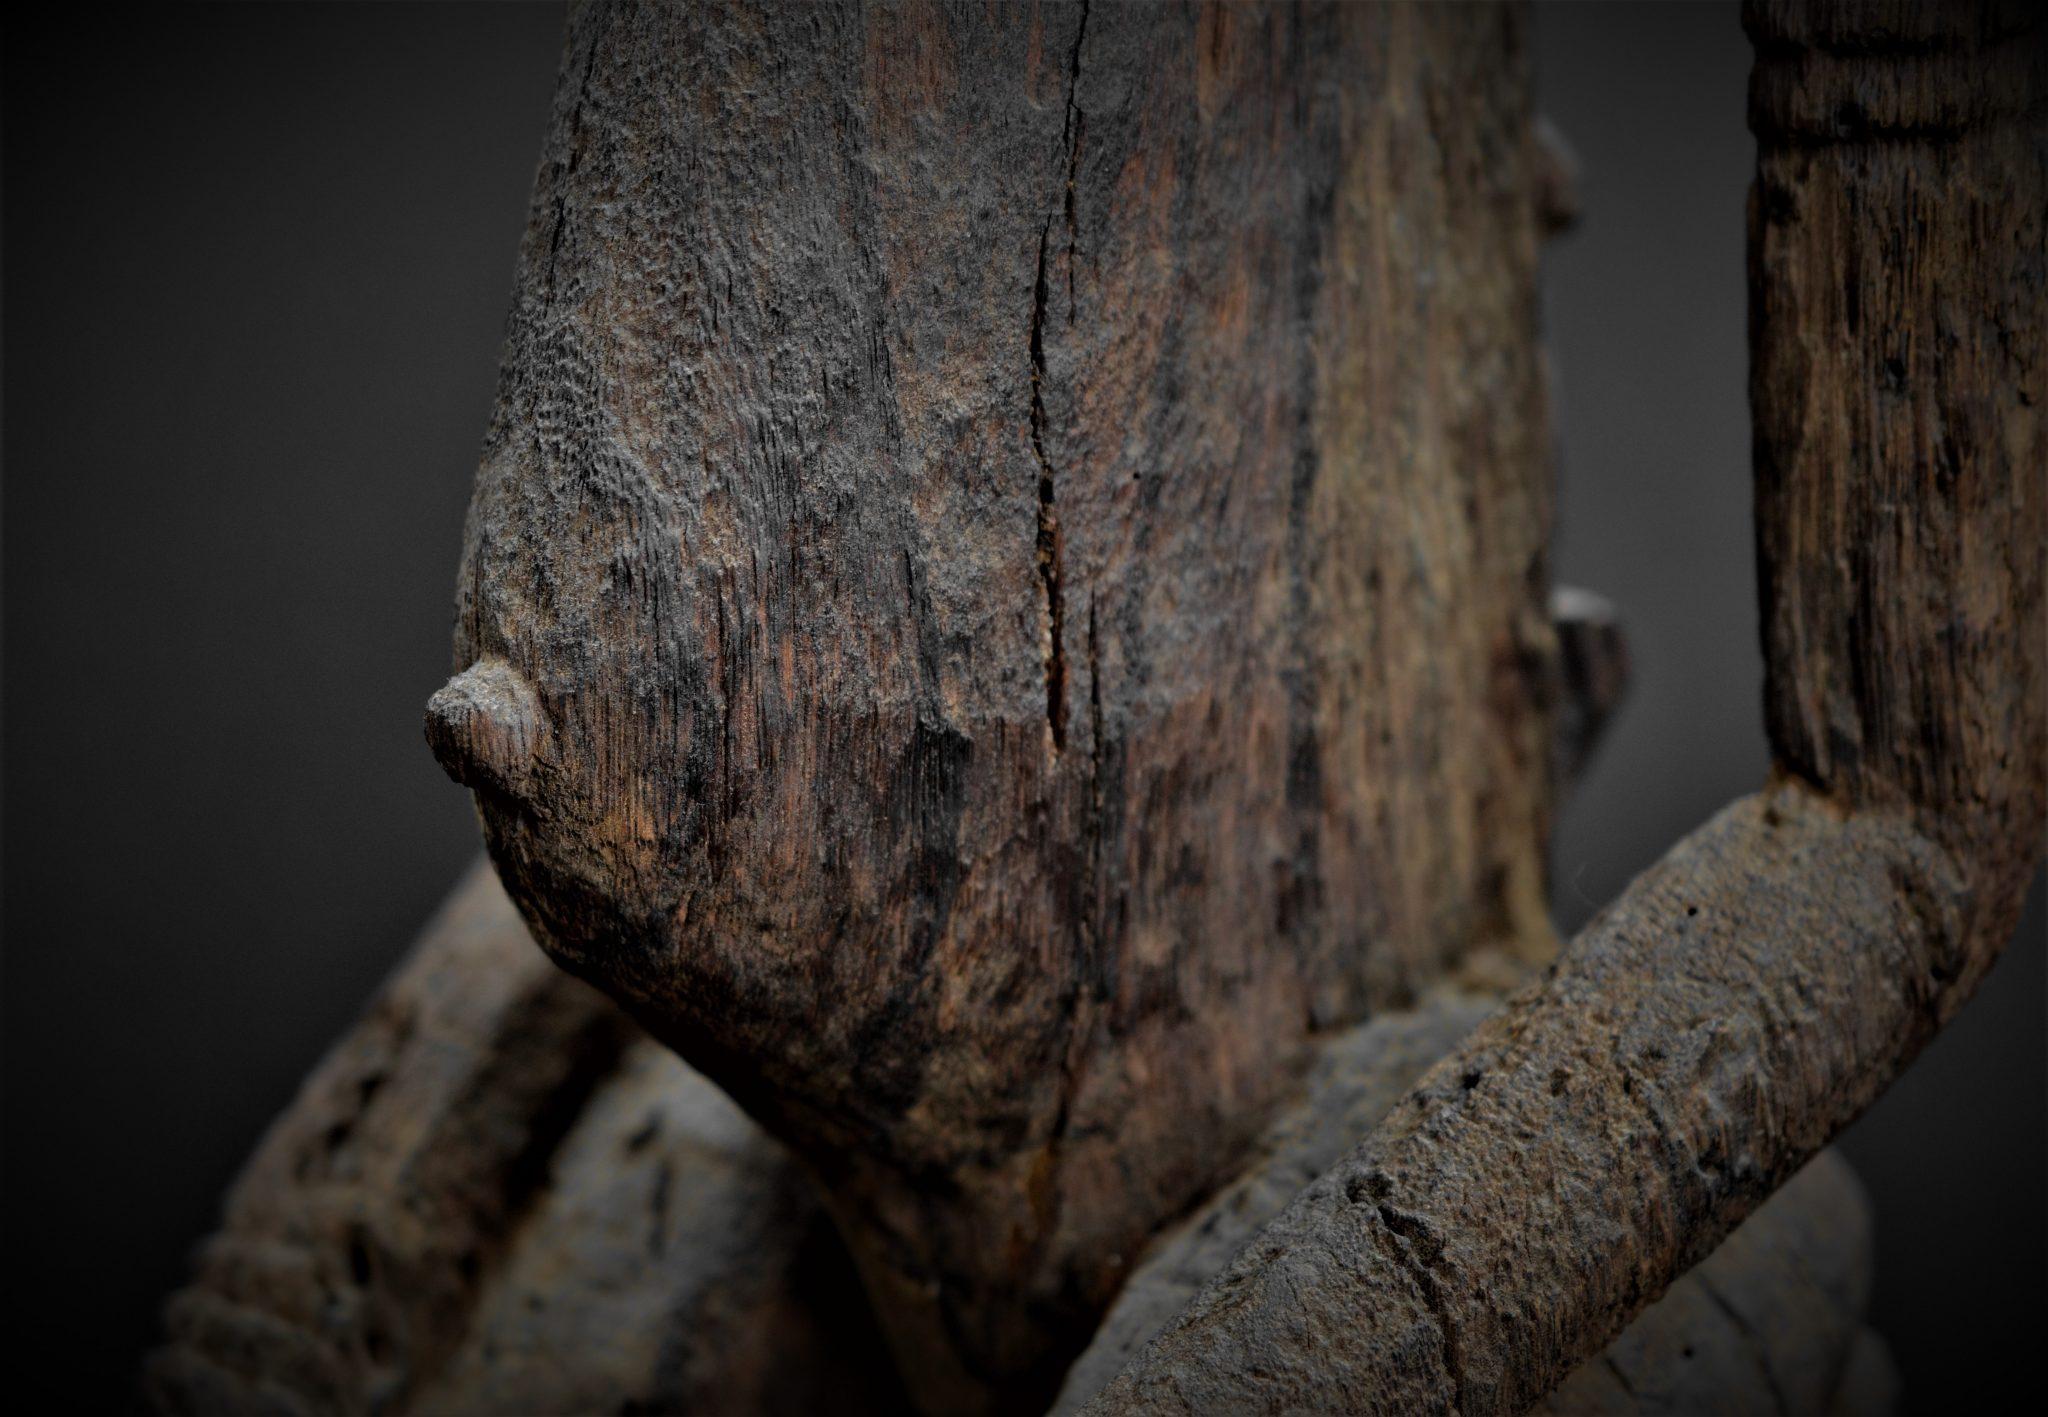 dogon statue detail abdomen